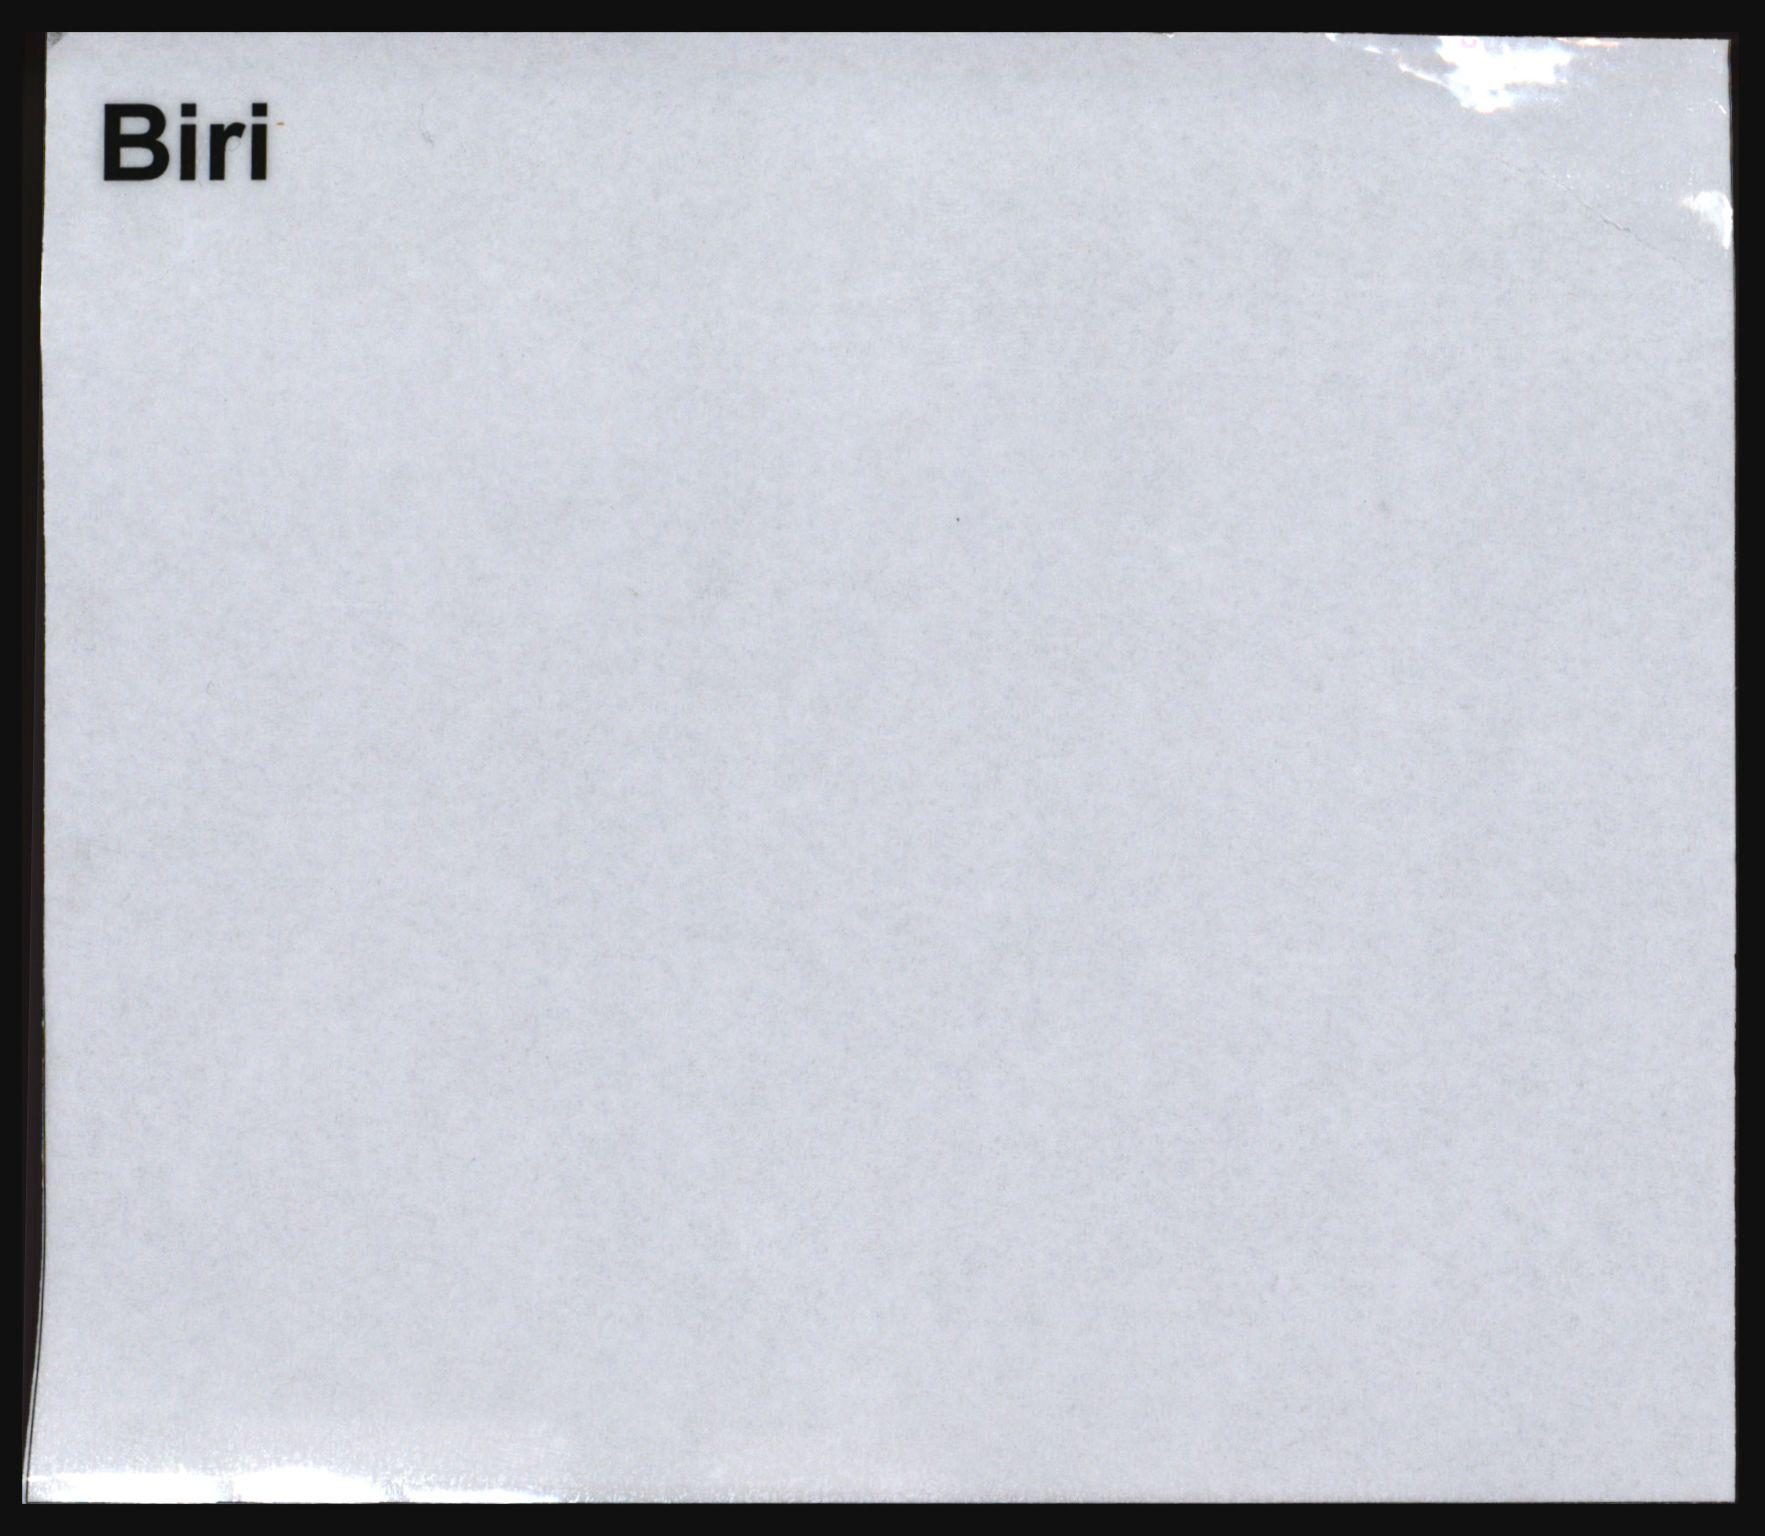 SAH, Norges Brannkasse, Biri, s. 1